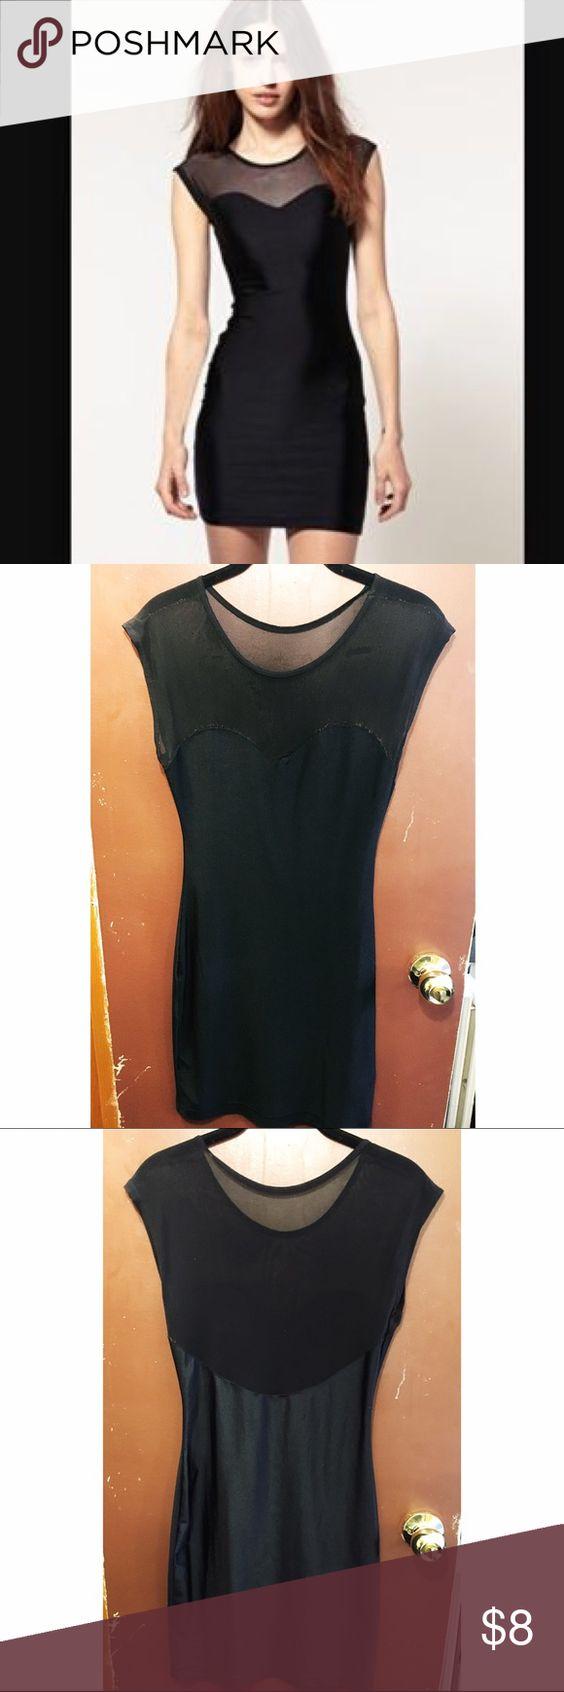 American Apparel Black Mesh Dress American Apparel Black Mesh Dress M/L. Neckline is worn but barely noticeable when on. American Apparel Dresses Mini